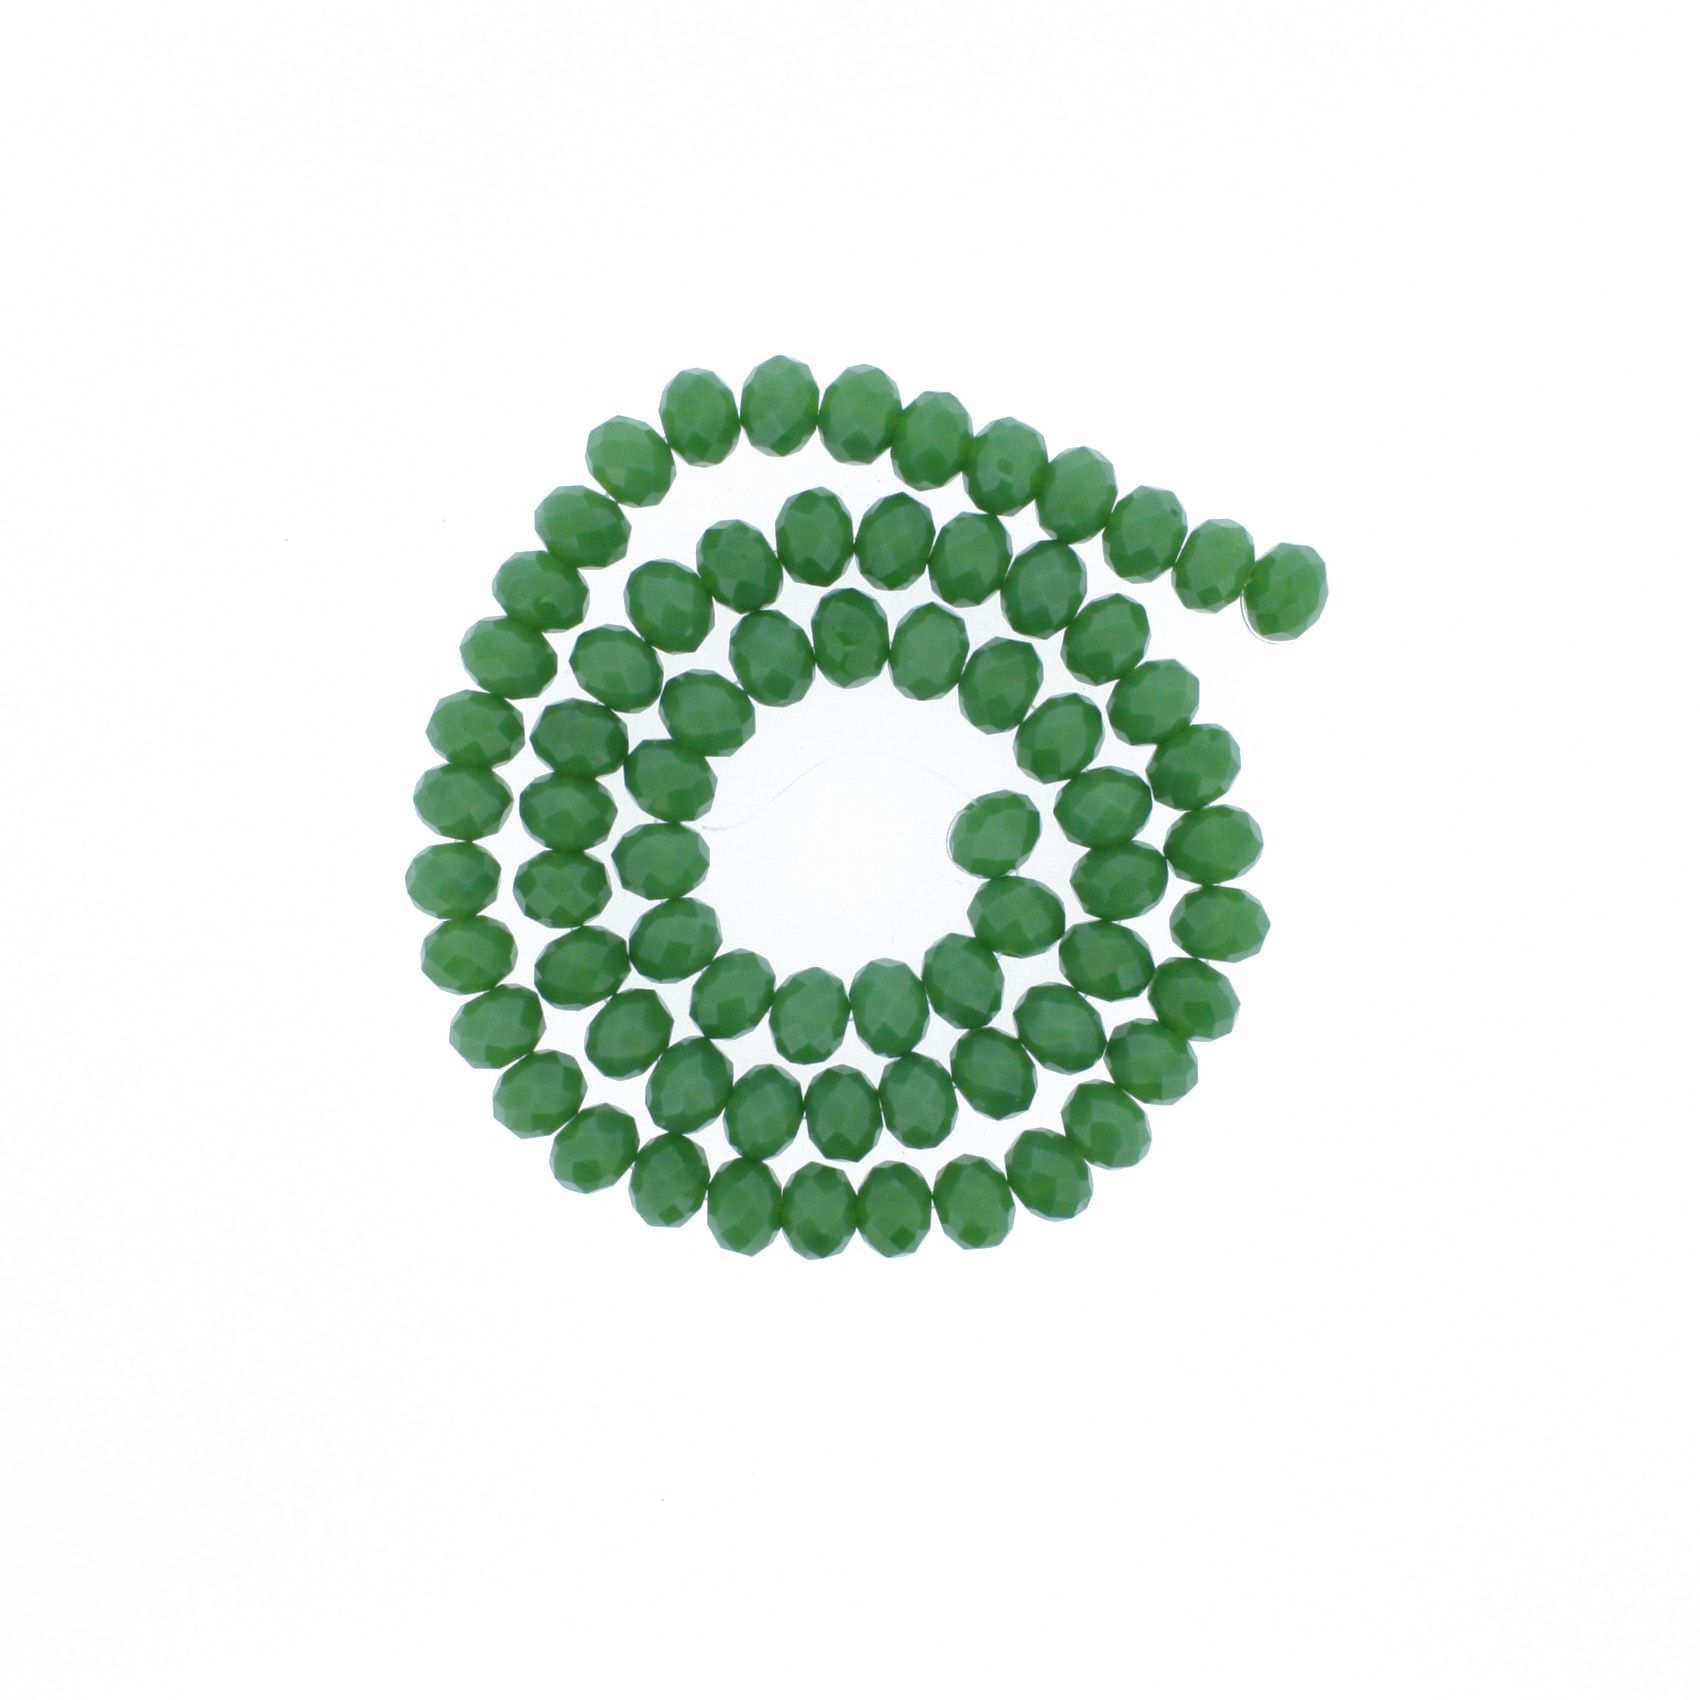 Fio de Cristal - Flat® - Verde - 8mm  - Stéphanie Bijoux® - Peças para Bijuterias e Artesanato